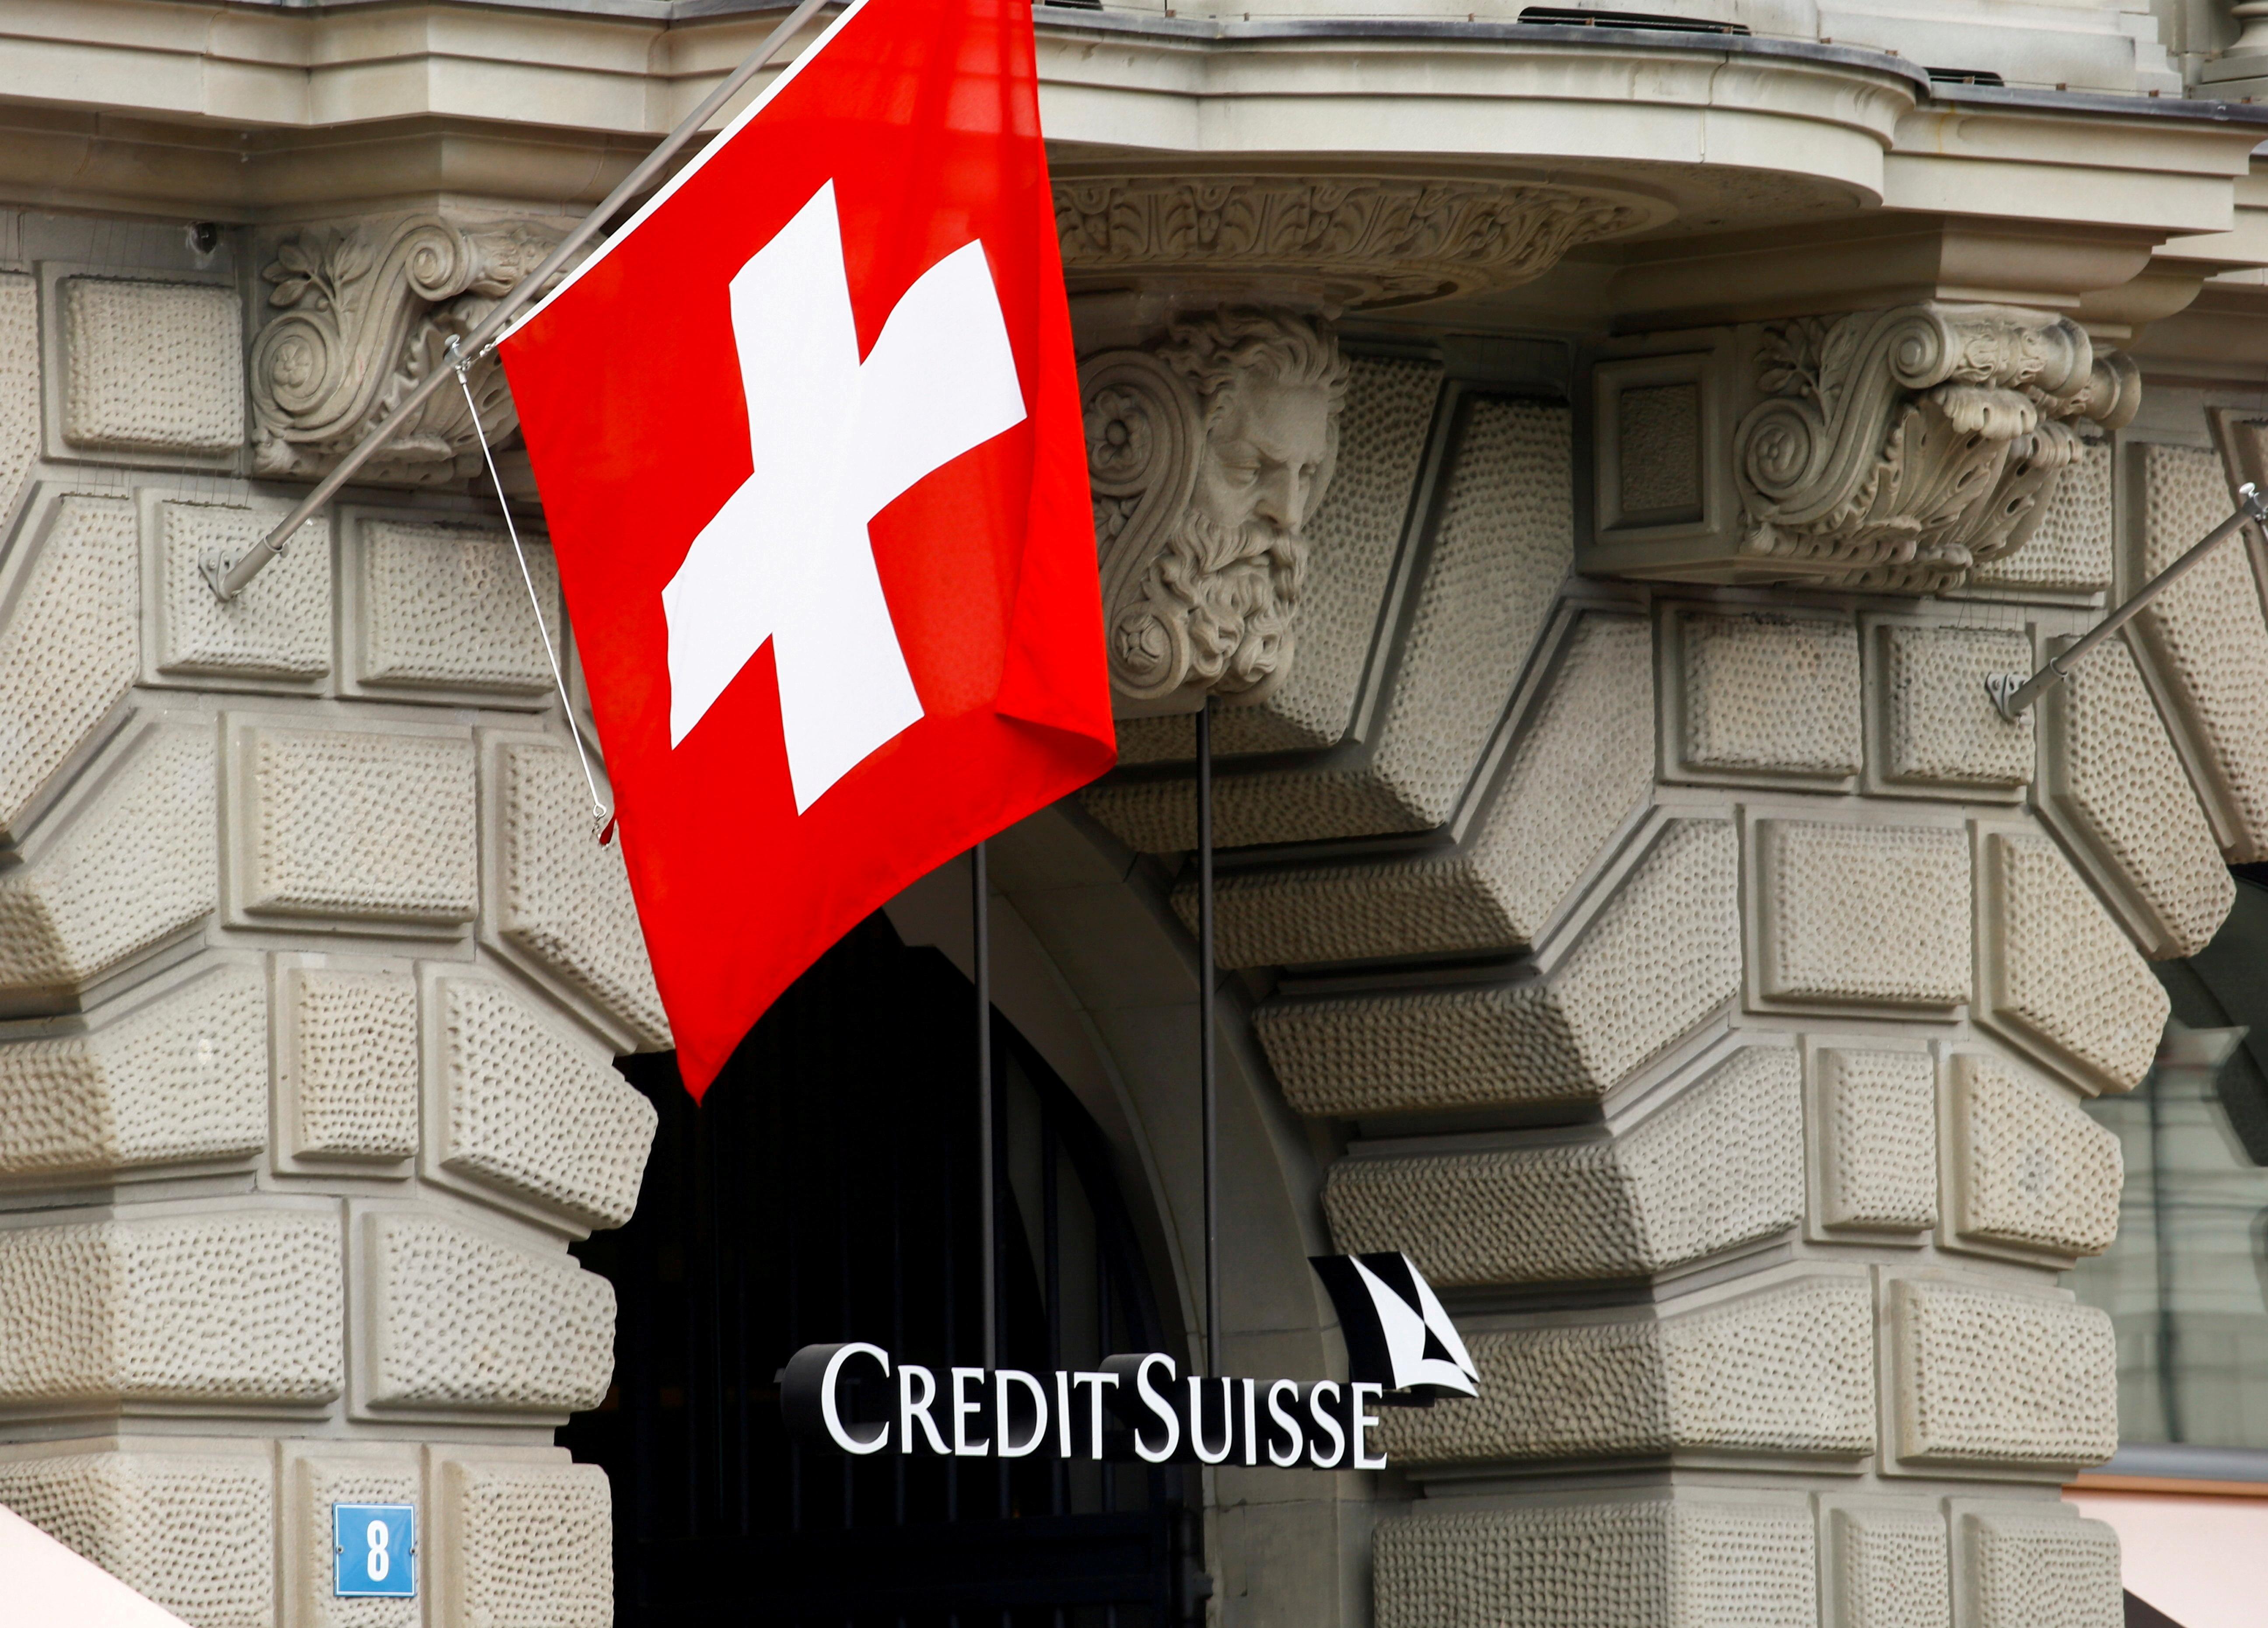 Switzerland's national flag flies above the logo of Swiss bank Credit Suisse at its headquarters in Zurich, Switzerland April 18, 2021. REUTERS/Arnd Wiegmann